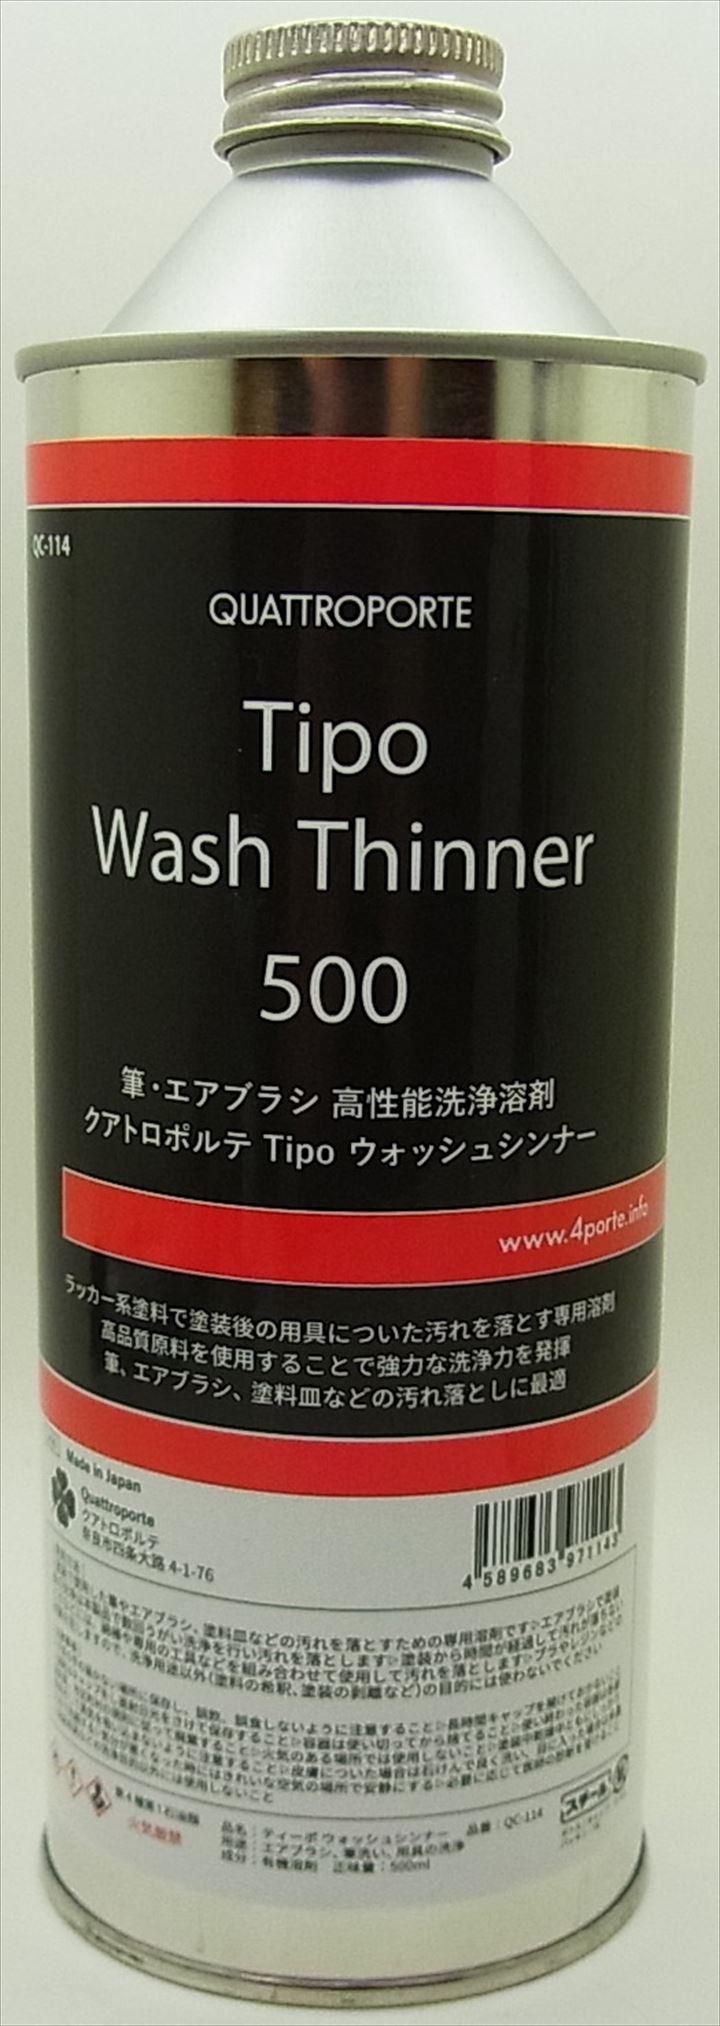 QC114 Tipo ウオッシュシンナー500   500ml